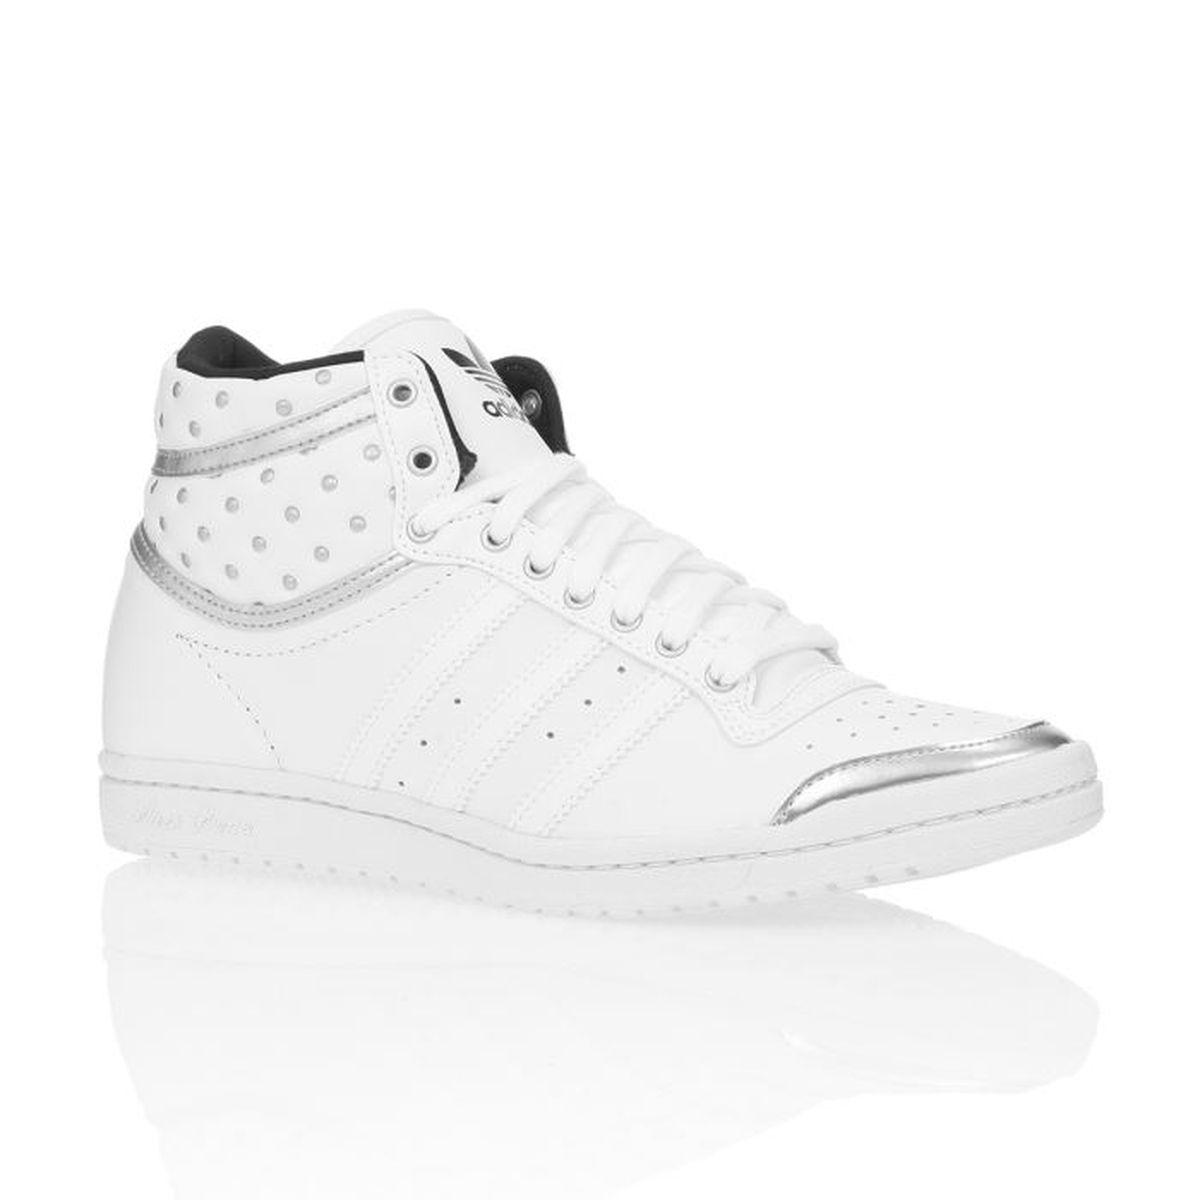 ADIDAS ORIGINALS Baskets Top Ten Hi Sleek Up Femme Blanc